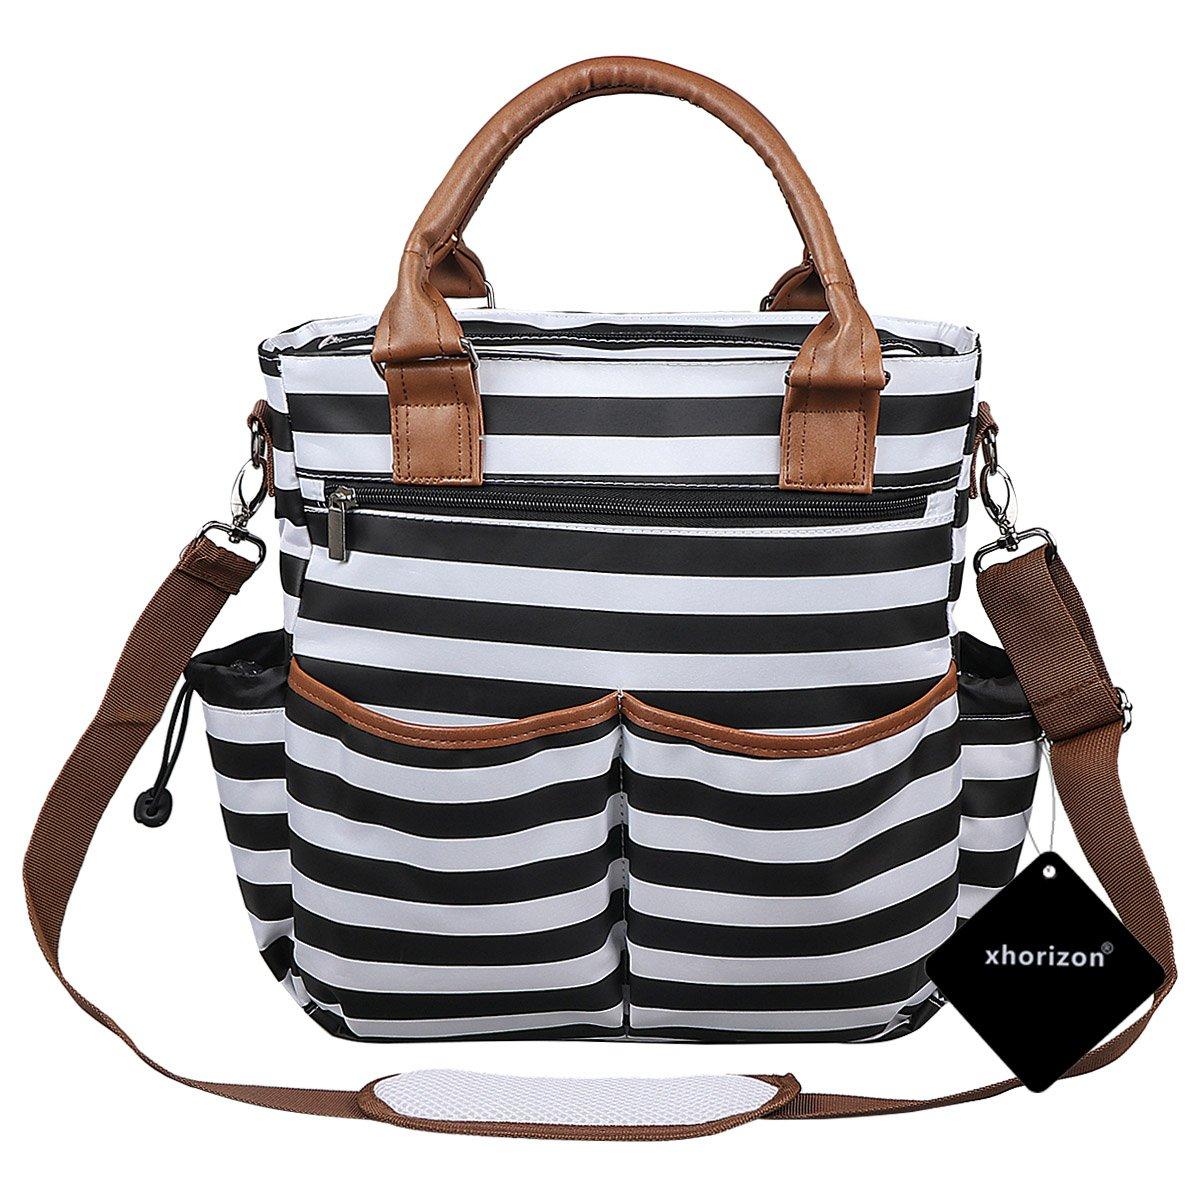 Diaper Bag, xhorizon TM SR Baby Changing Pad Baby Cushioned Changing Mat, Messenger Organizer Tote, Multifunction Large Capacity Hand Bag Shoulder Bag